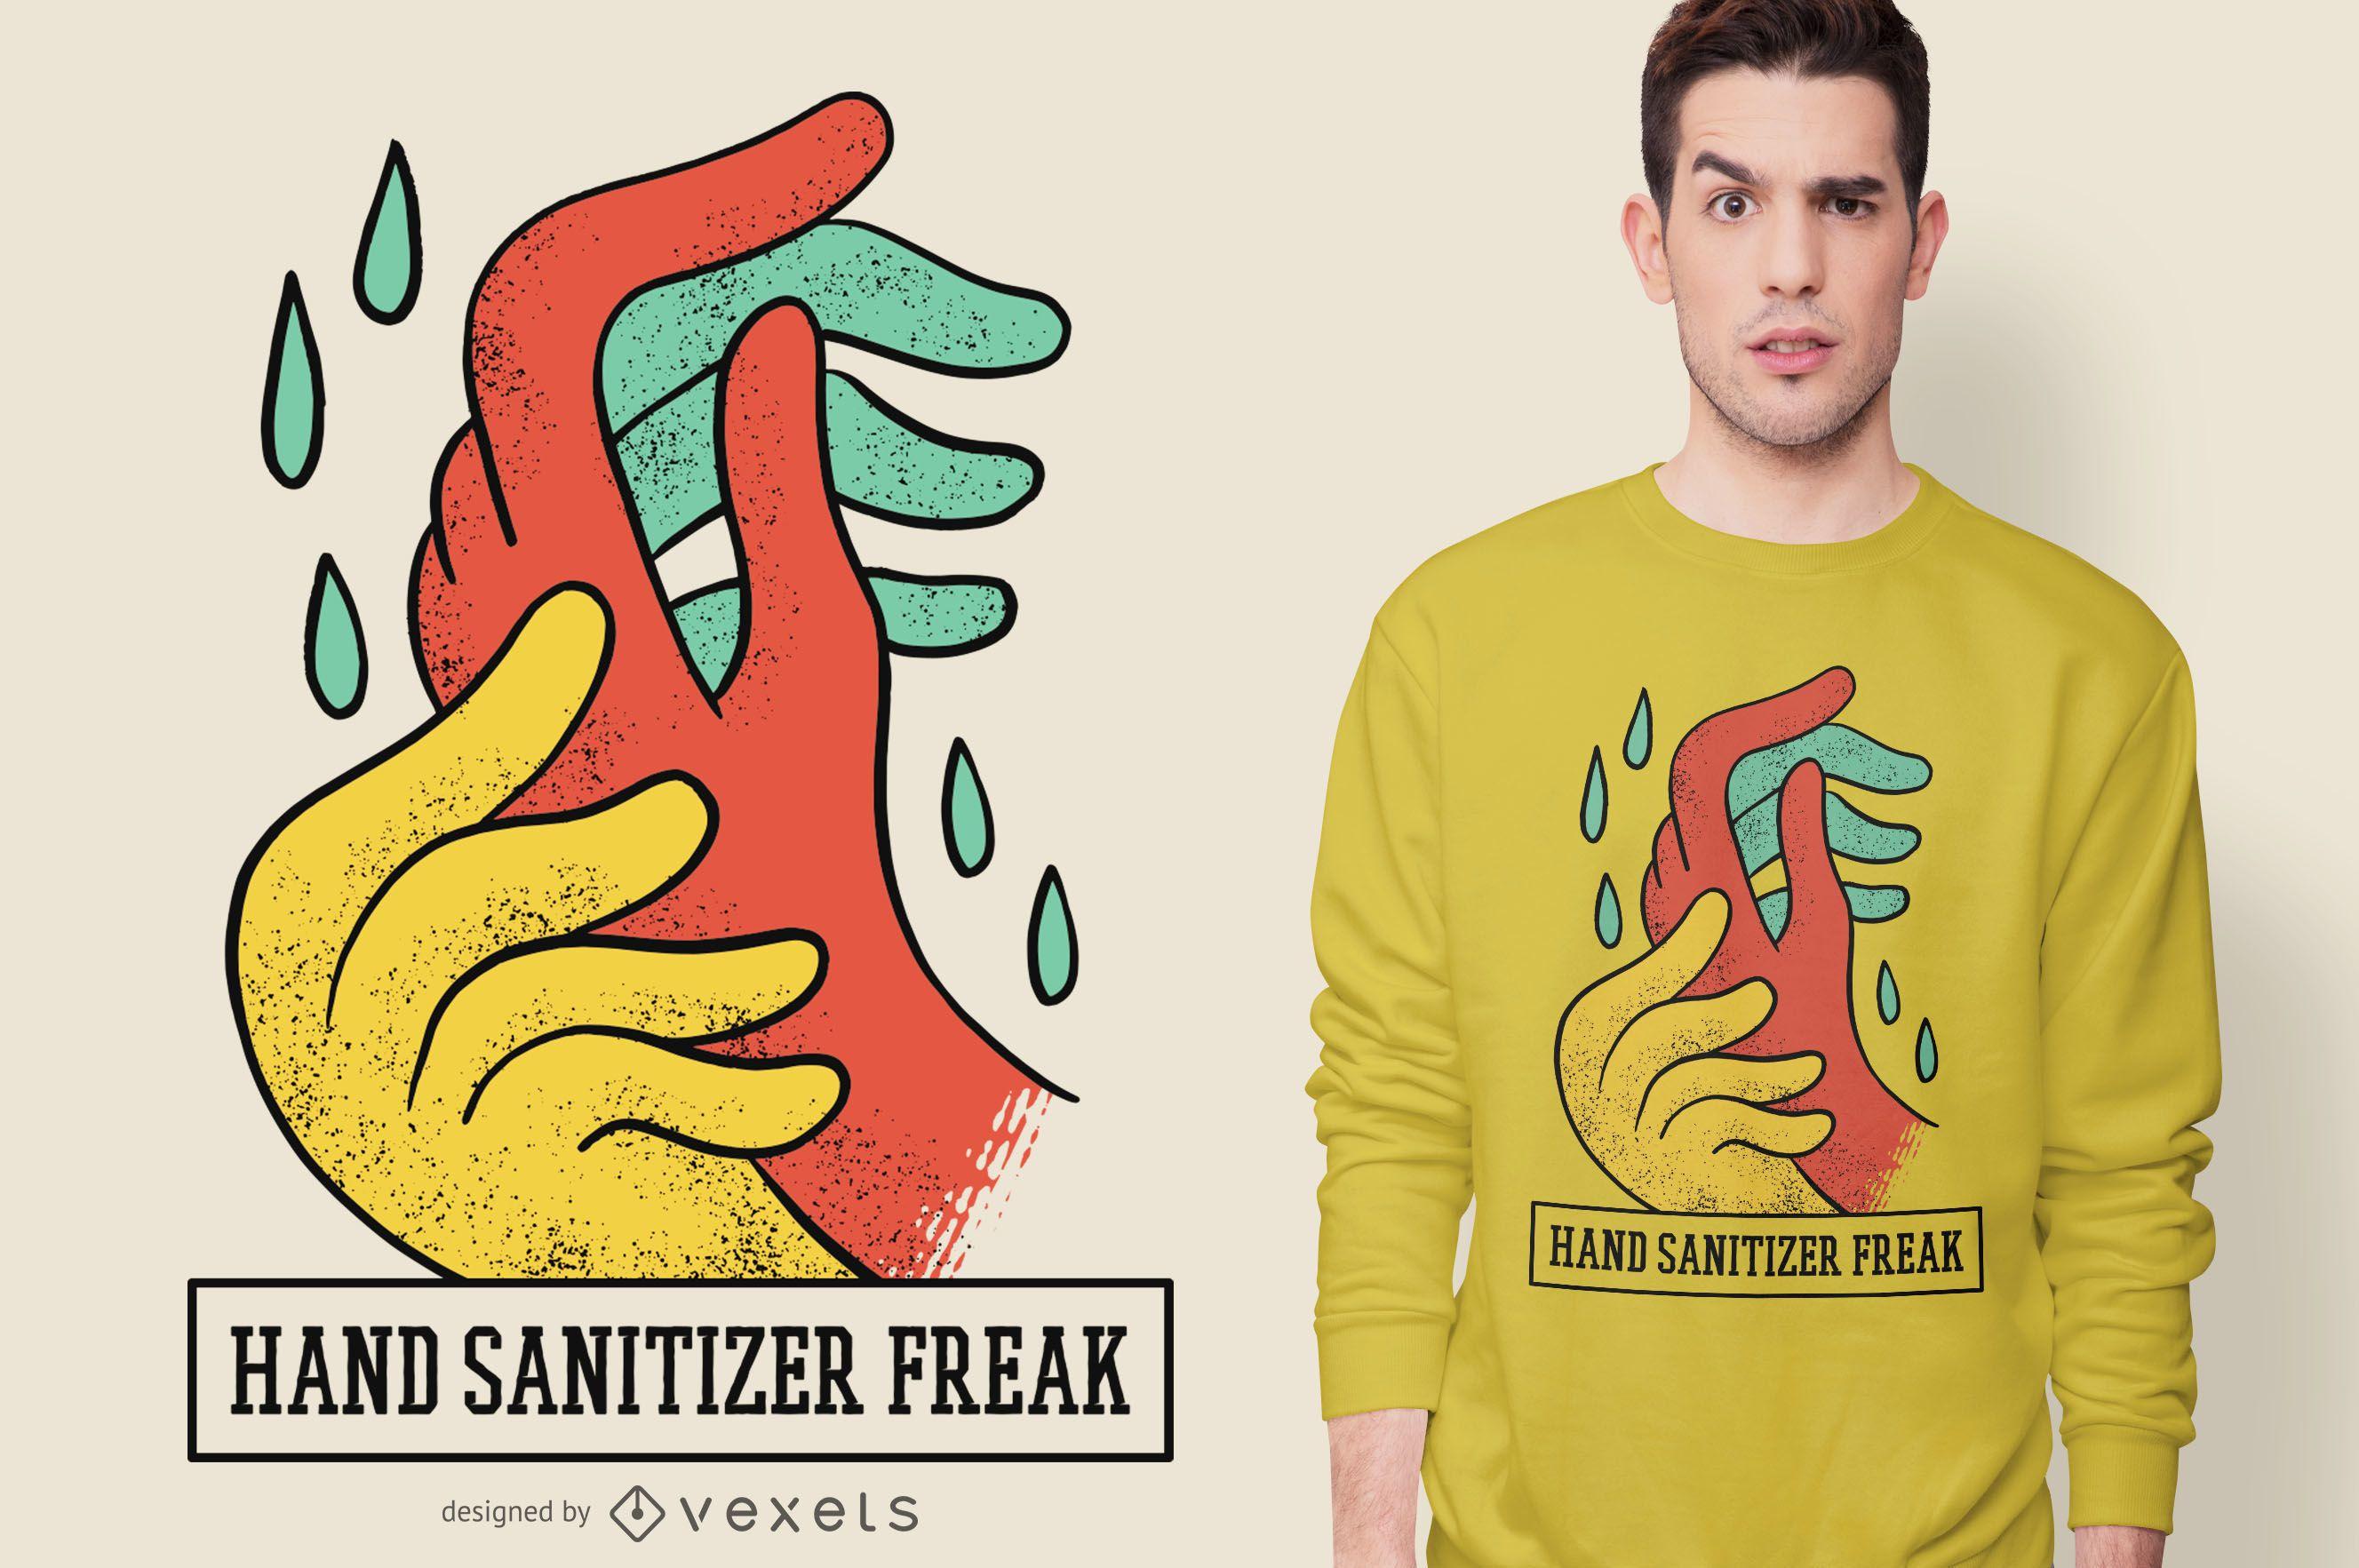 Hand Sanitizer Freak T-shirt Design